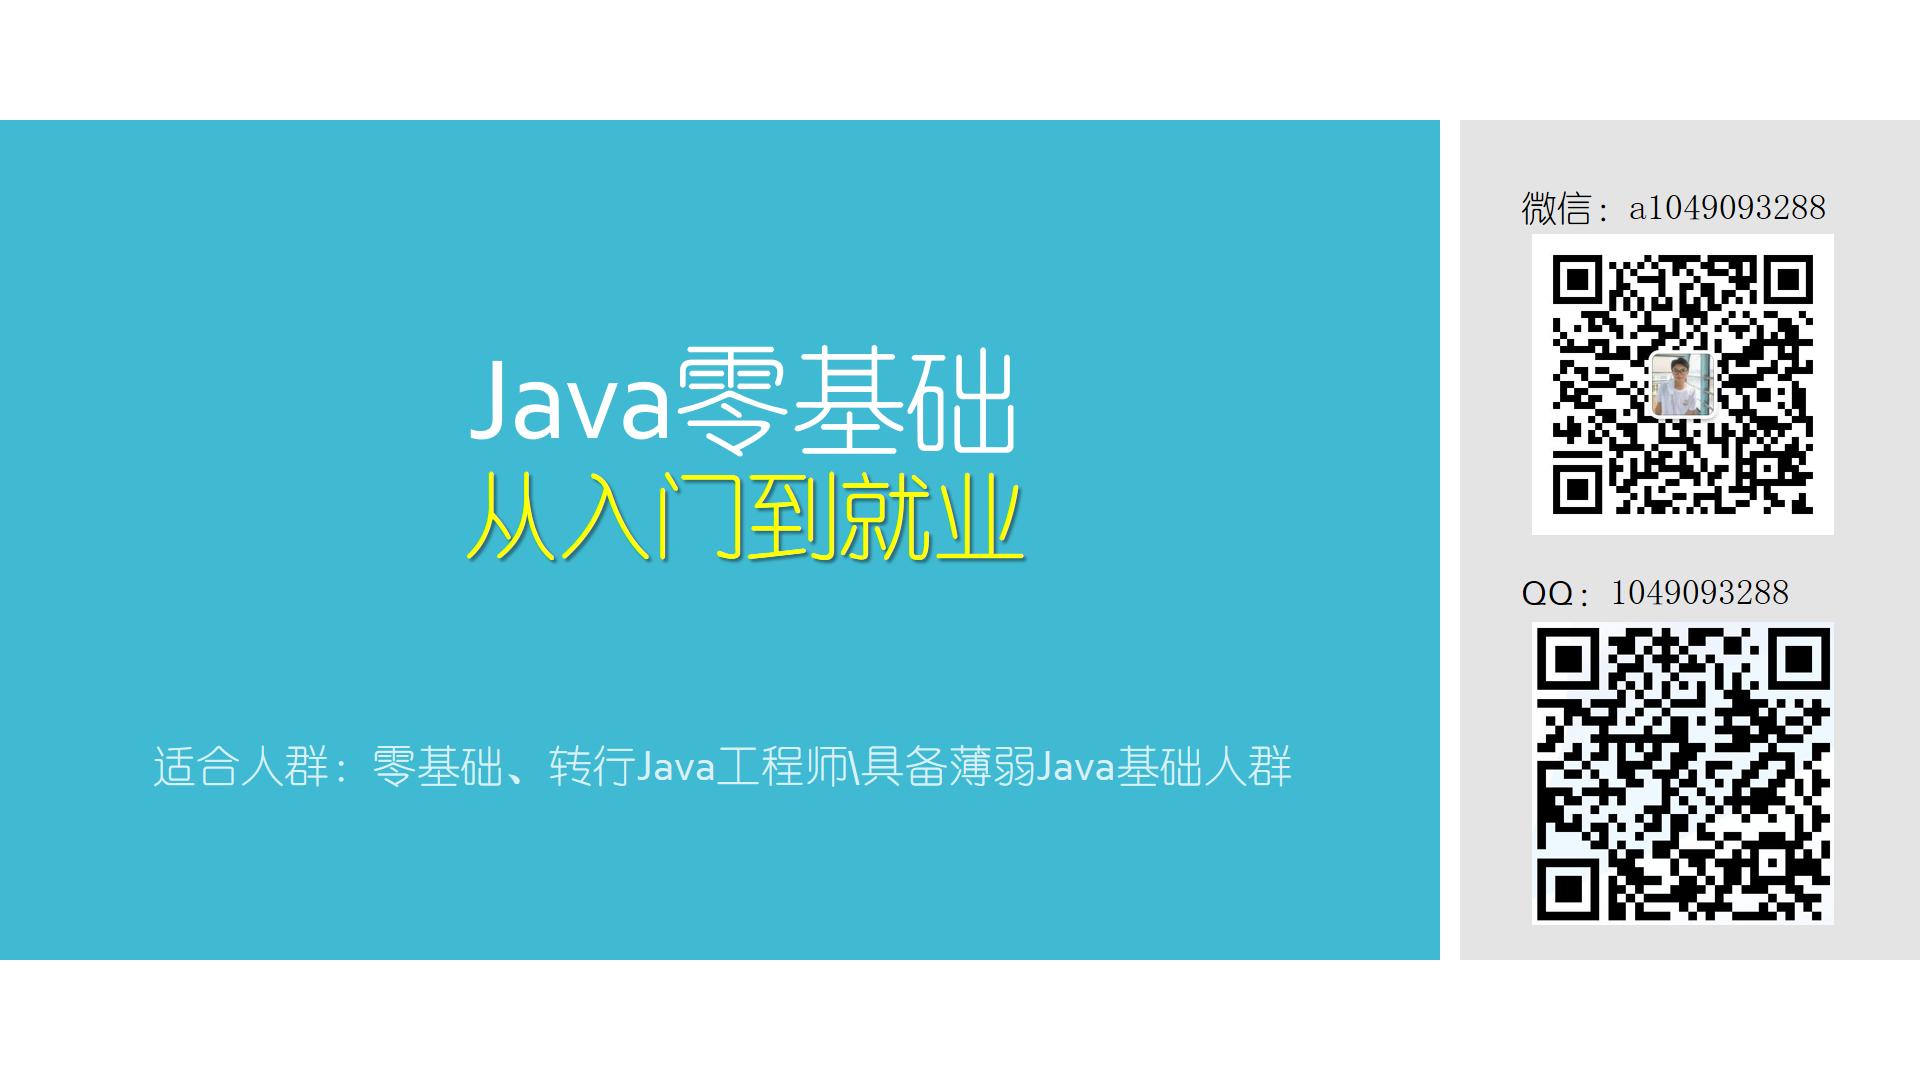 Java零基础入门到就业+企业级电商项目